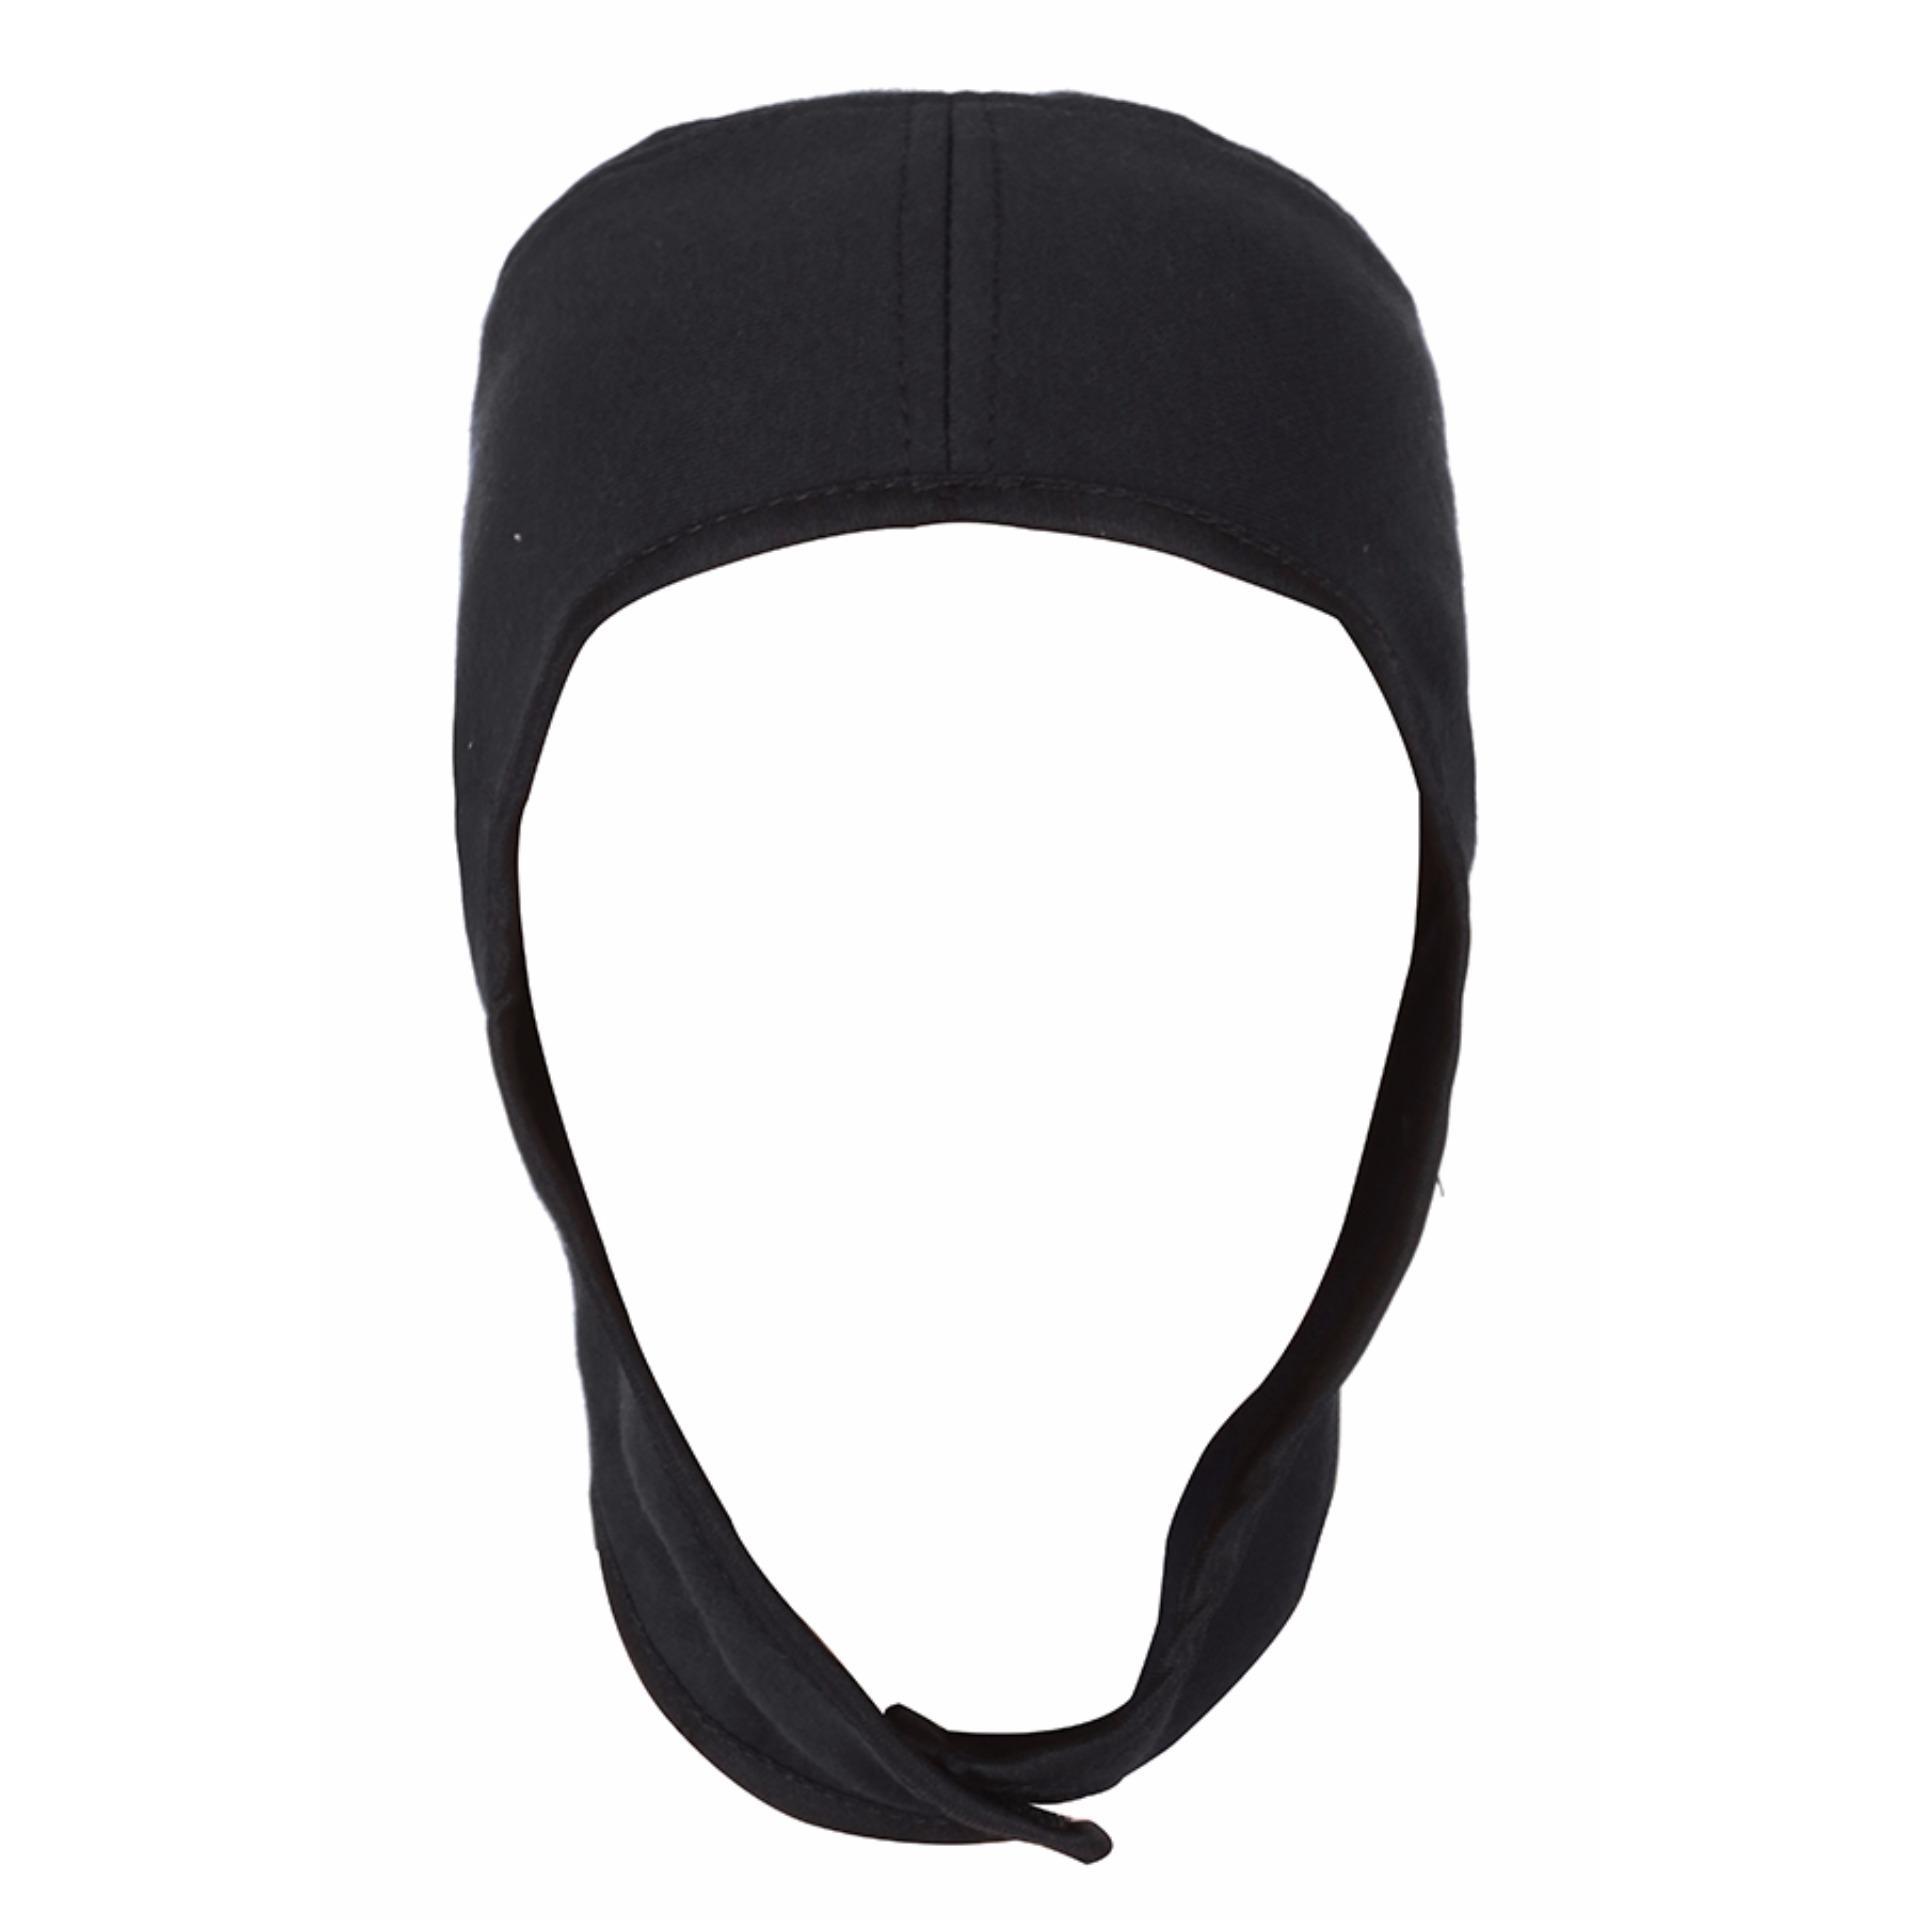 Kalibre Balaclava Headwear Alas Helm Tutup Kepala Masker Mask991167 Topi Hat Newsboy Flat Cap Biru Navy Abu 991186 999 Elfs Shop Cupluk Motor Skull Terry